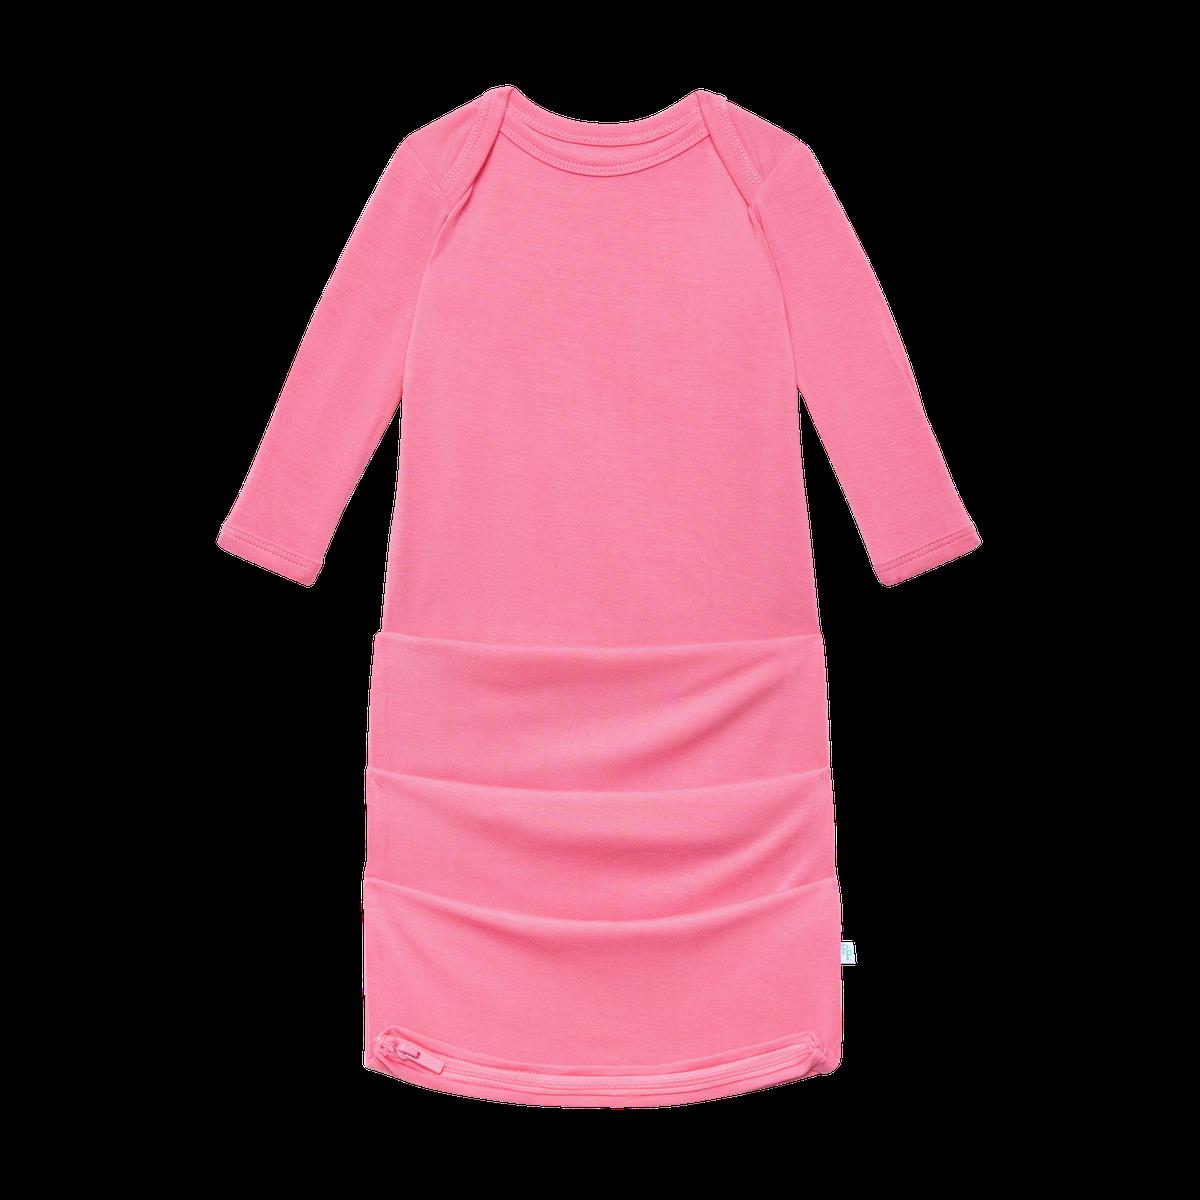 Posh Peanut Solid Pink Lemonade Basic Zippered Gown, 0/3M